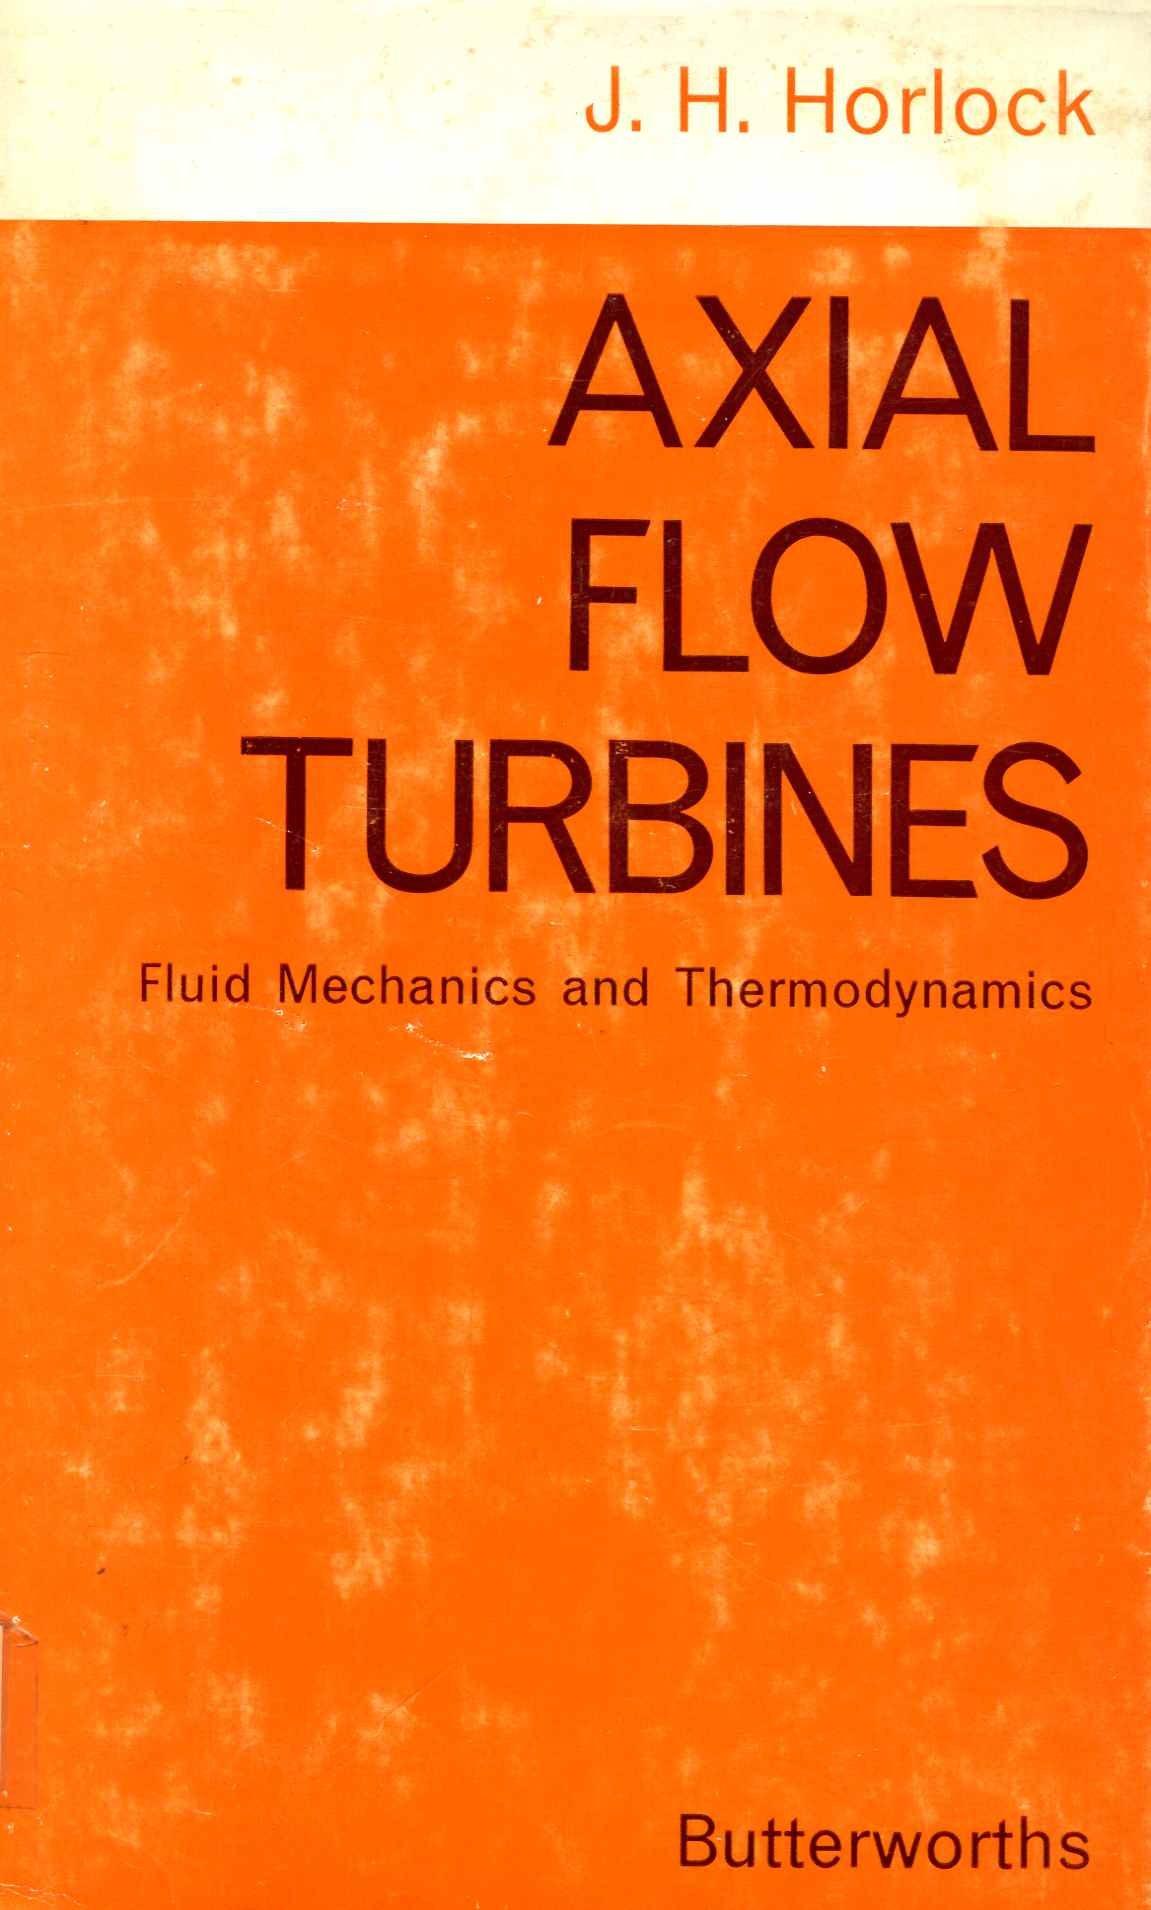 Axial Flow Turbines J H Horlock Amazon Books